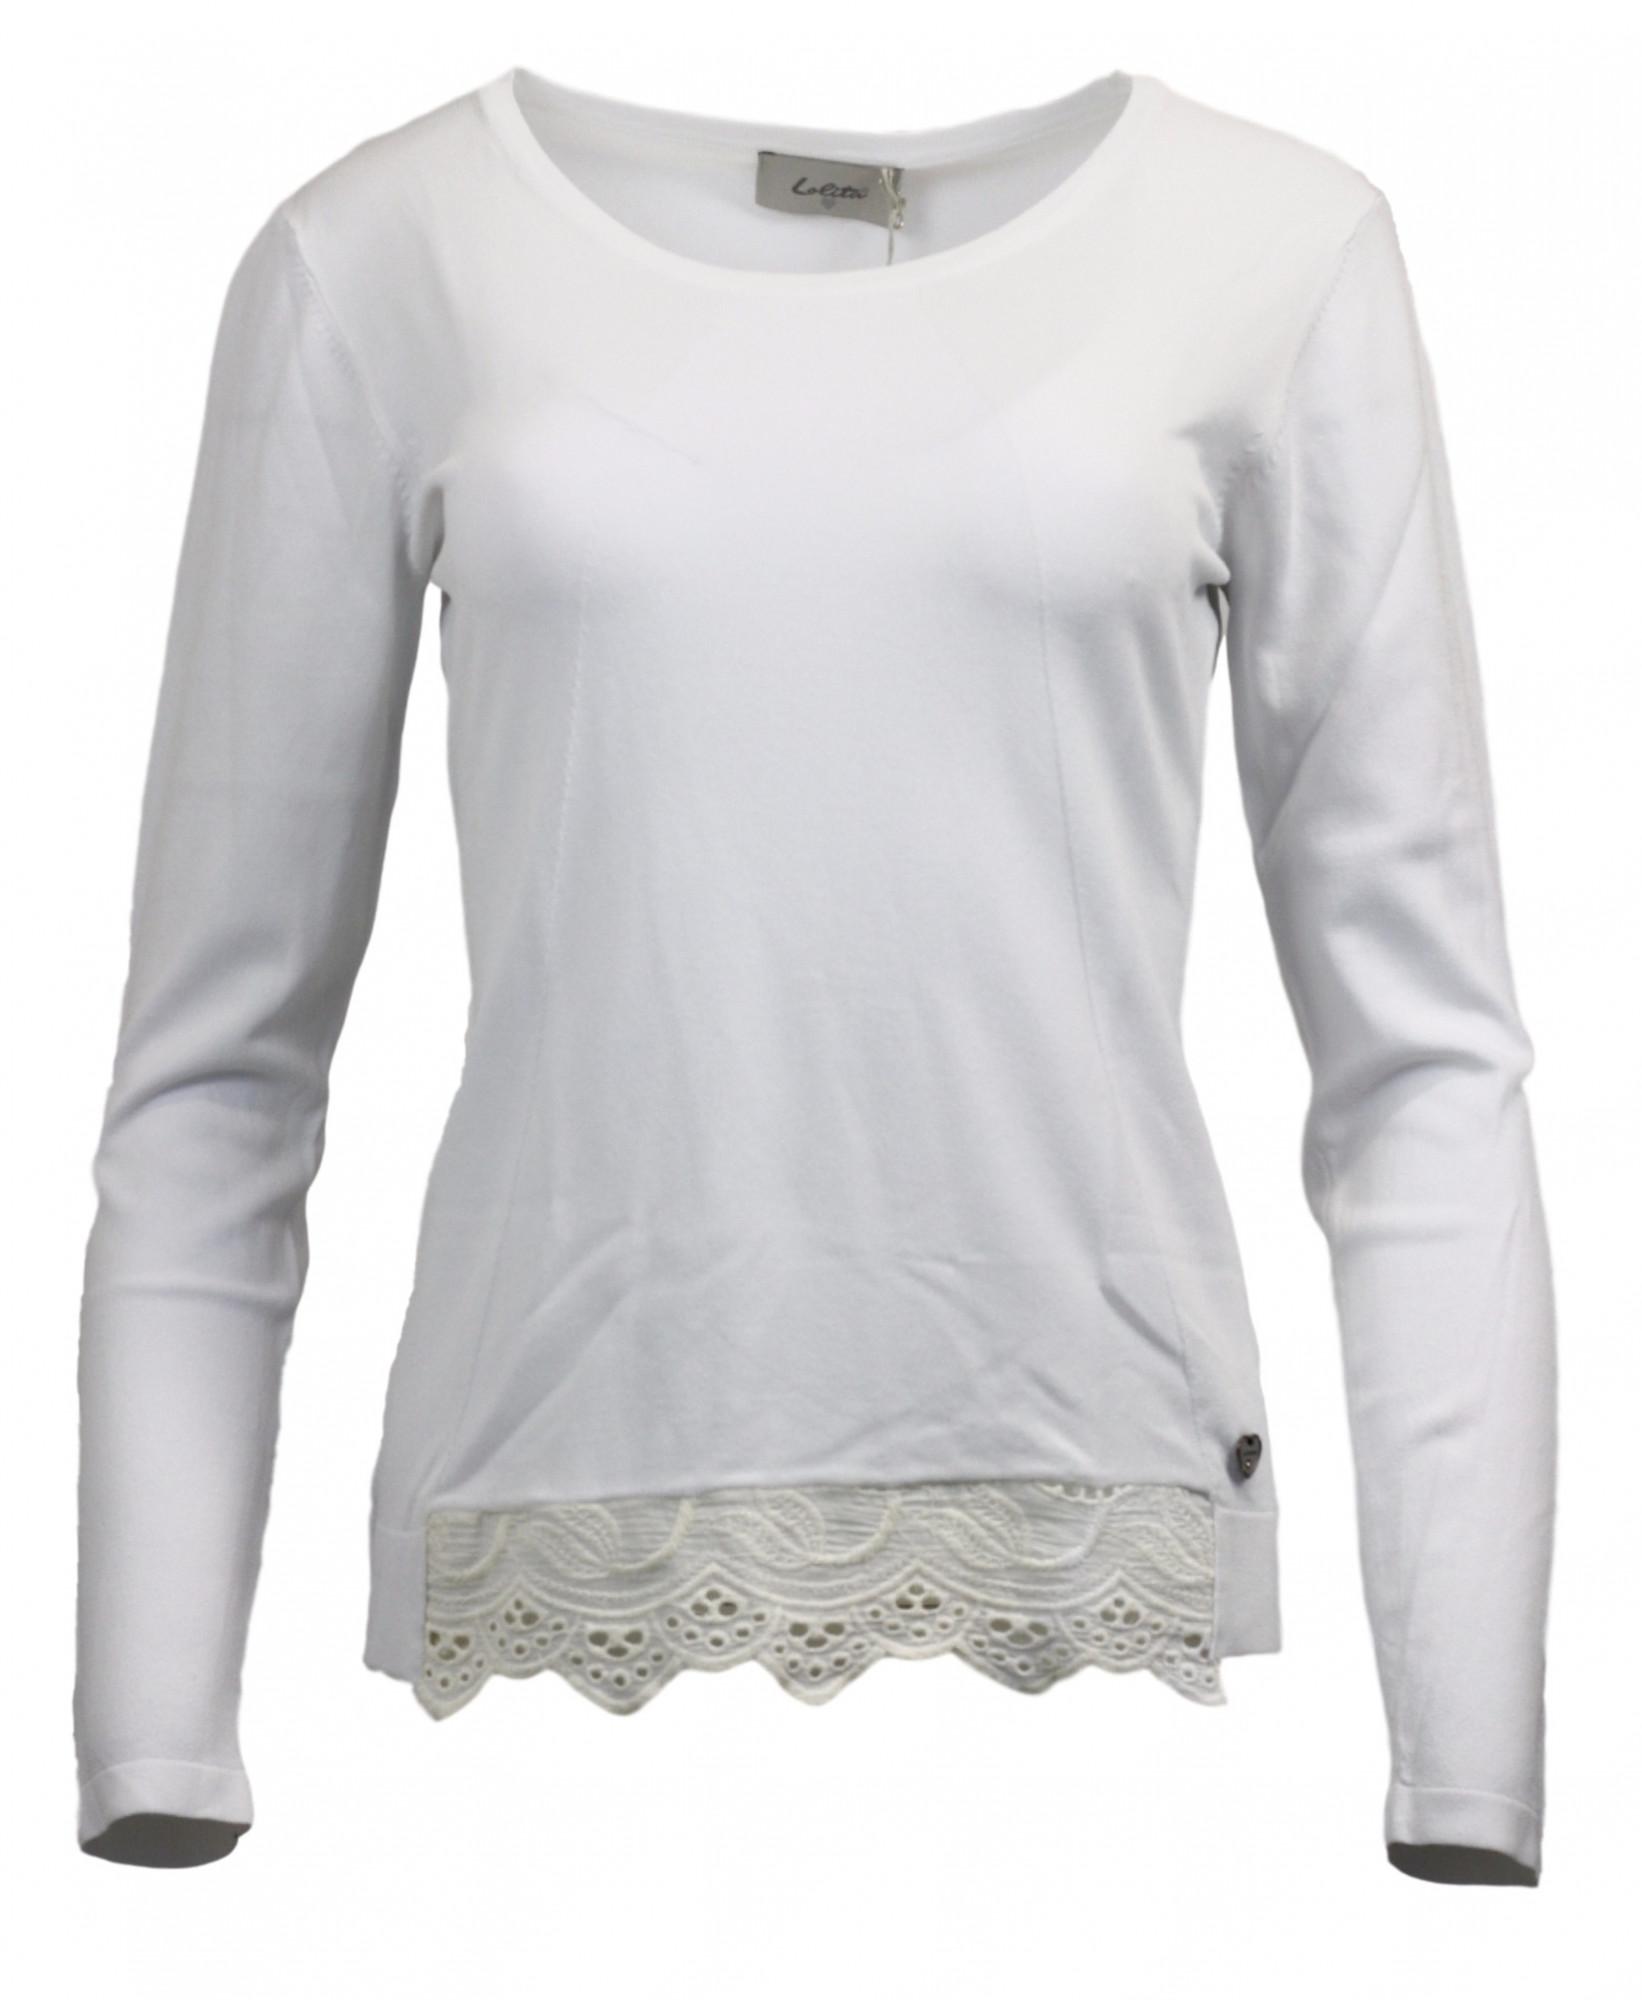 Dámský svetřík Lolita 24095 Barva: bílá, Velikost: M/L